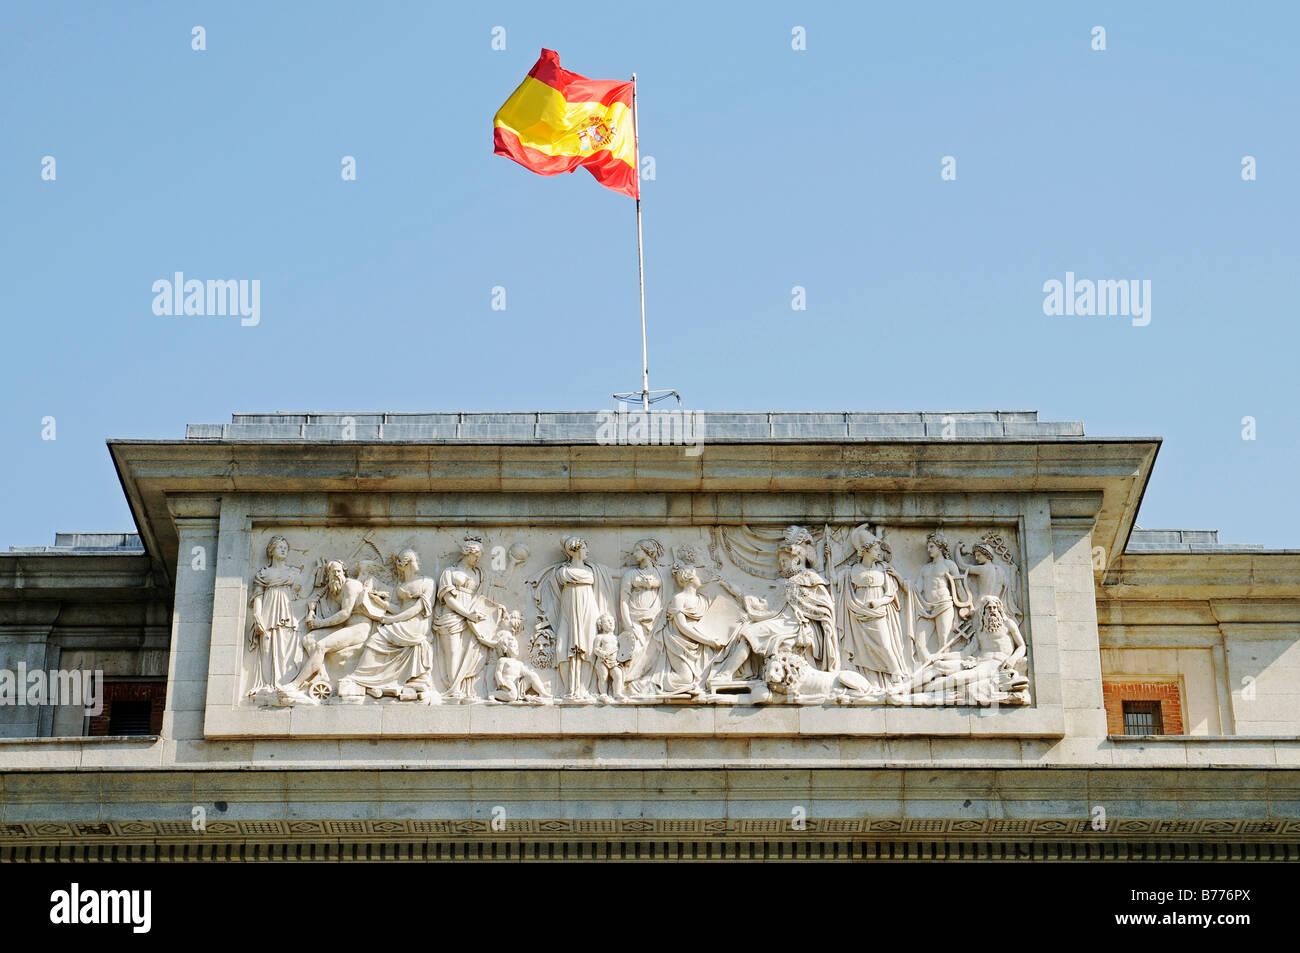 National flag, front, entrance, Puerta de Velazquez, Prado, museum, Madrid, Spain, Europe - Stock Image